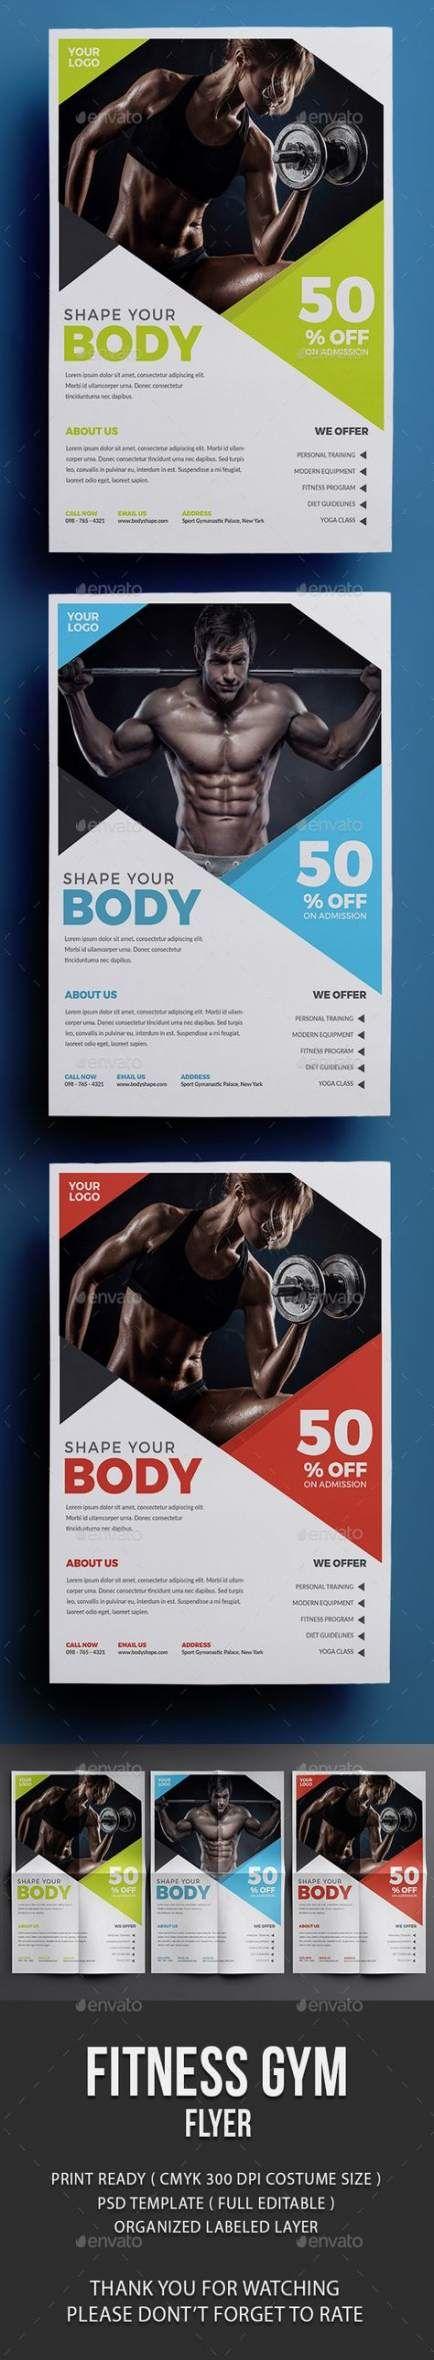 67  Ideas Fitness Poster Design Inspiration #fitness